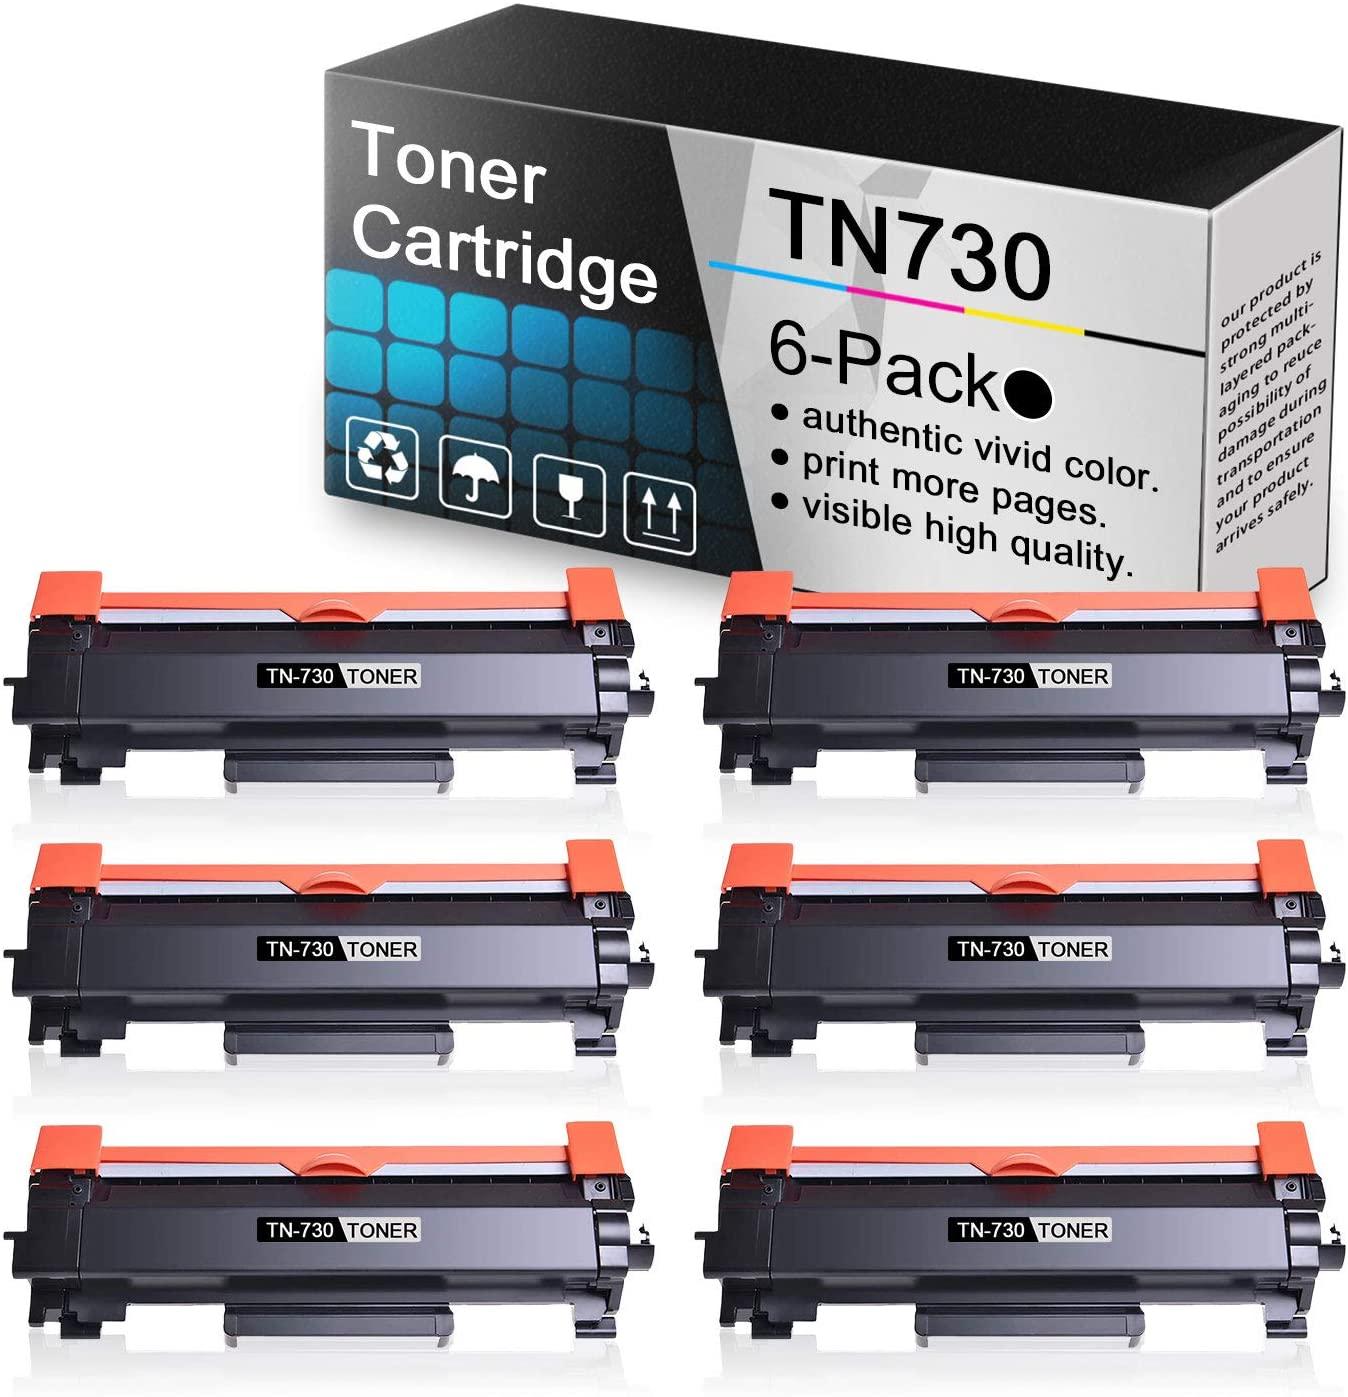 (6 Pack Black Toner Cartridge TN730) Compatible Toner Cartridge Replacement for Brother DCP-L2550DW MFC-L2710DW MFC-L2750DW MFC-L2750DW HL-L2350DW HL-L2370DW/DWXL HL-L2390DW HL-L2395DW Printers.